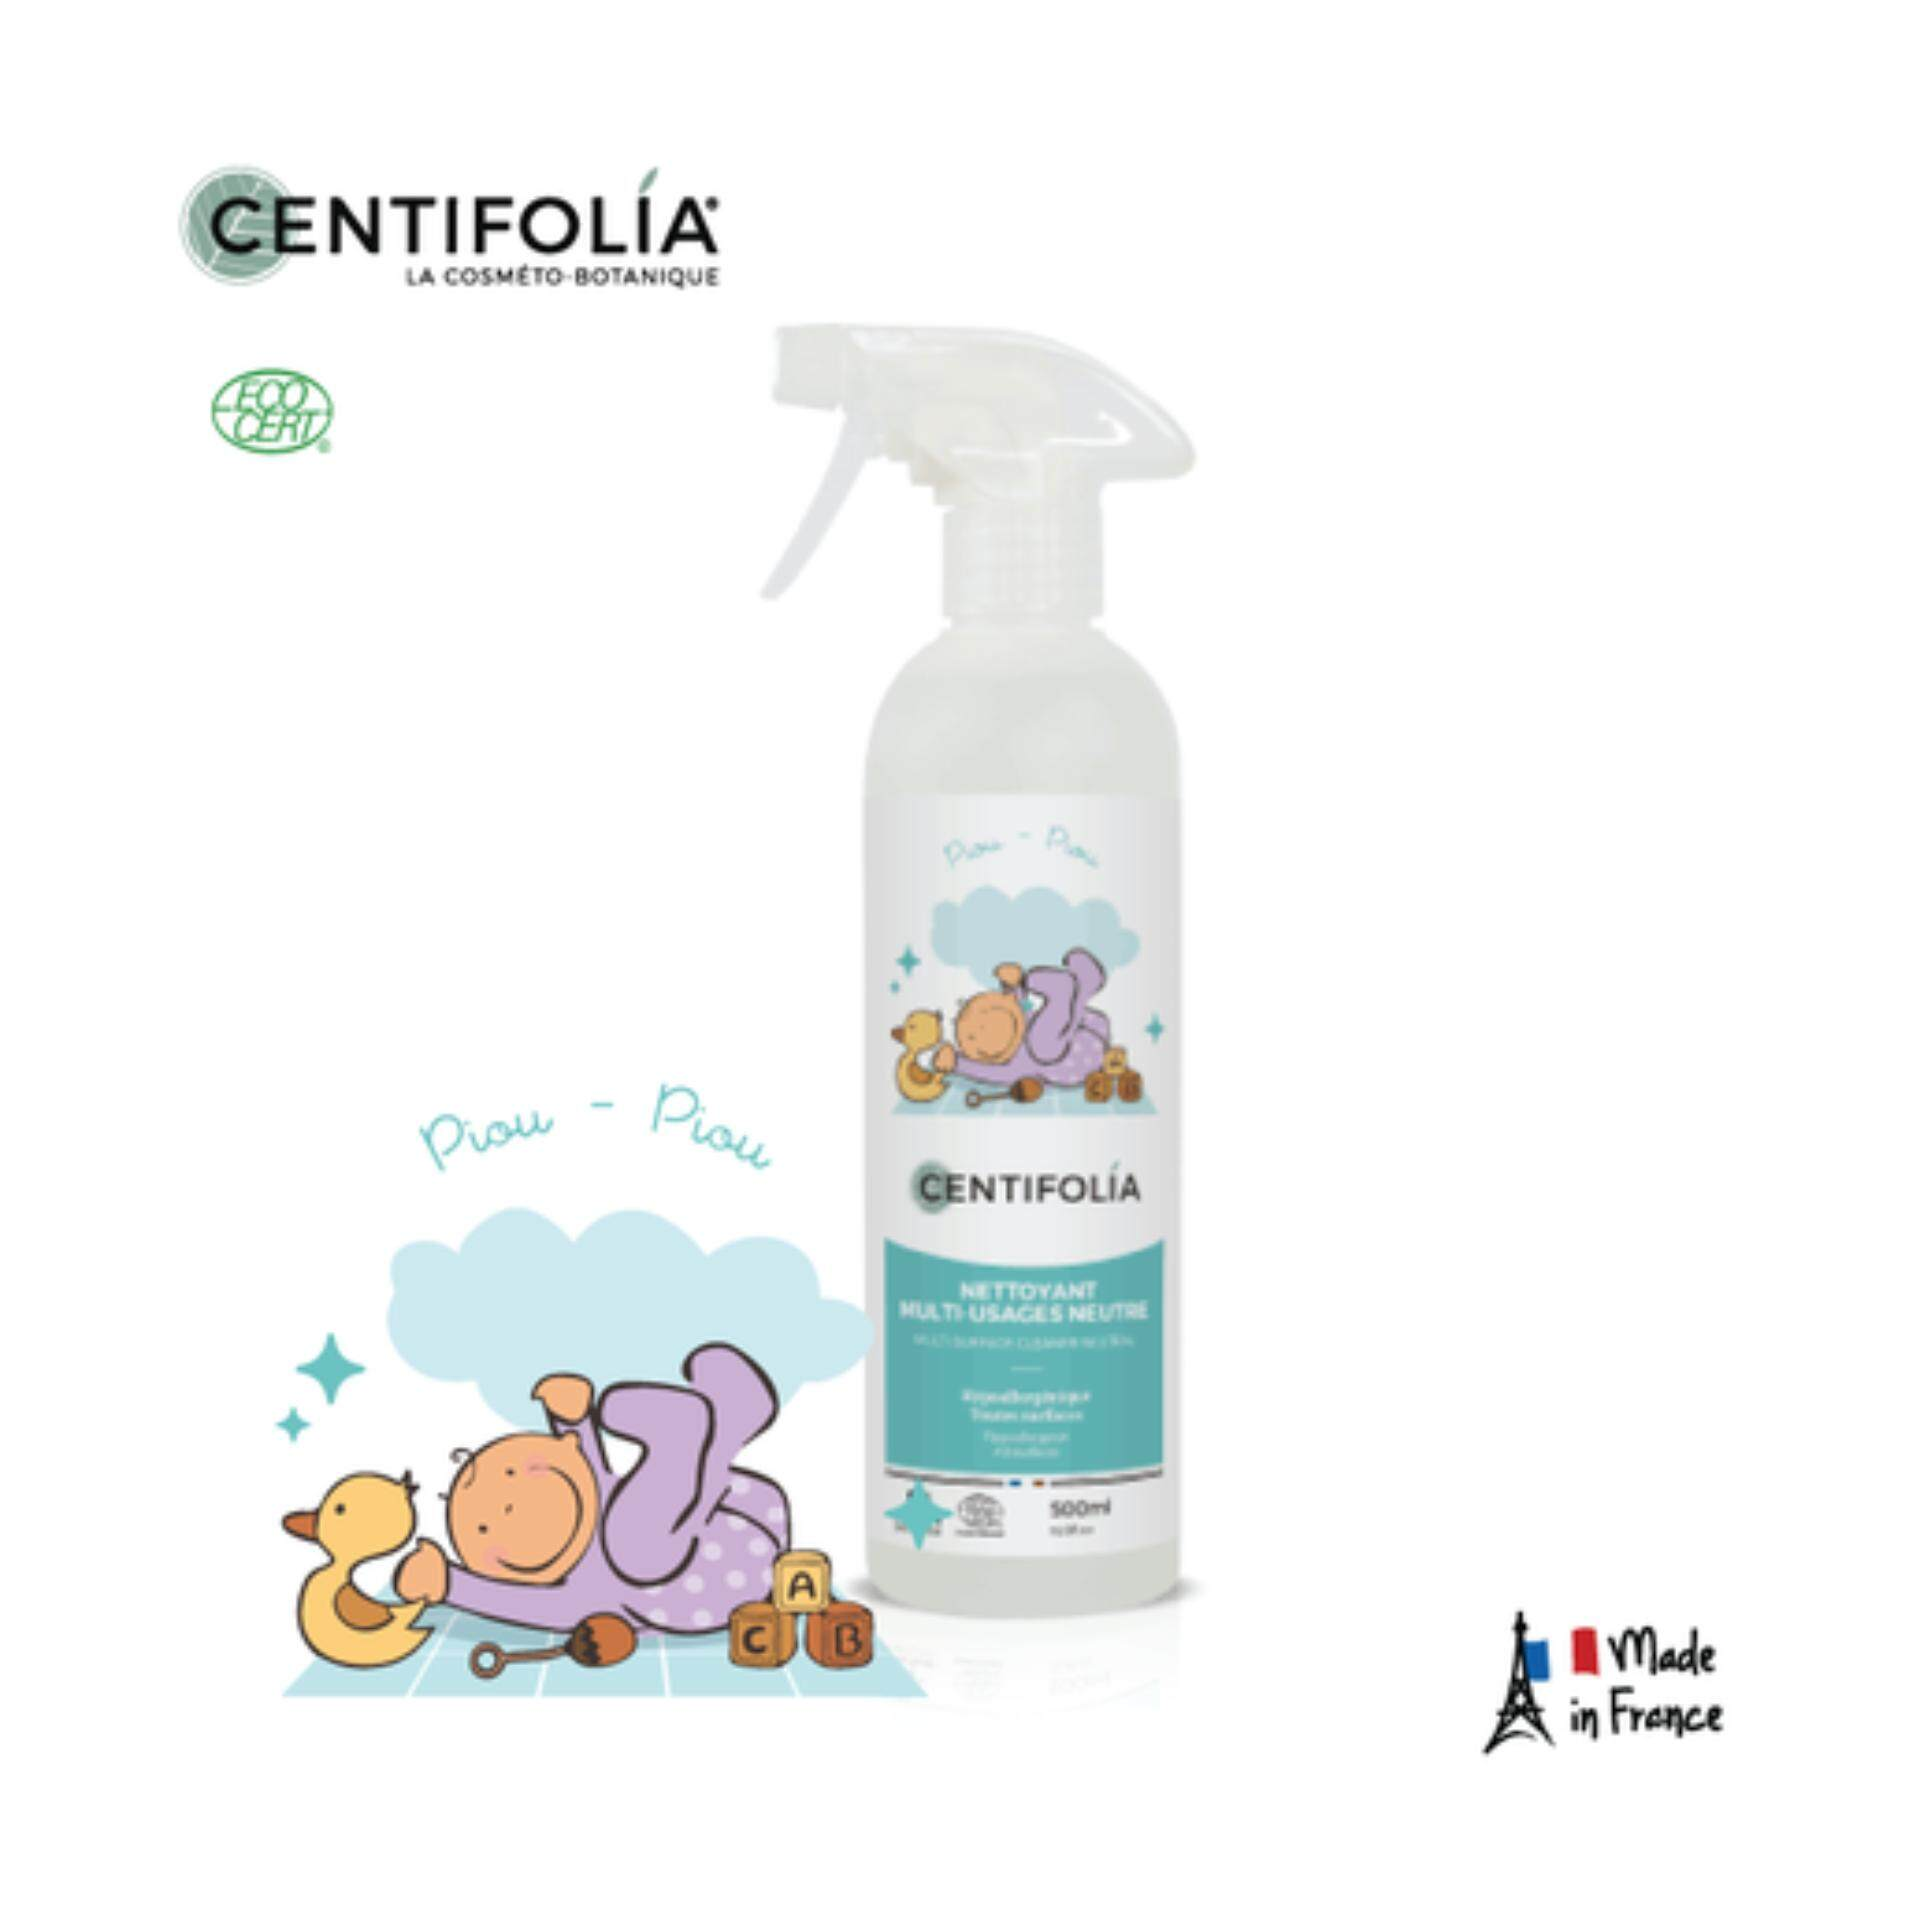 Centifolia Bebe Multi-Purpose Cleaner 500ml